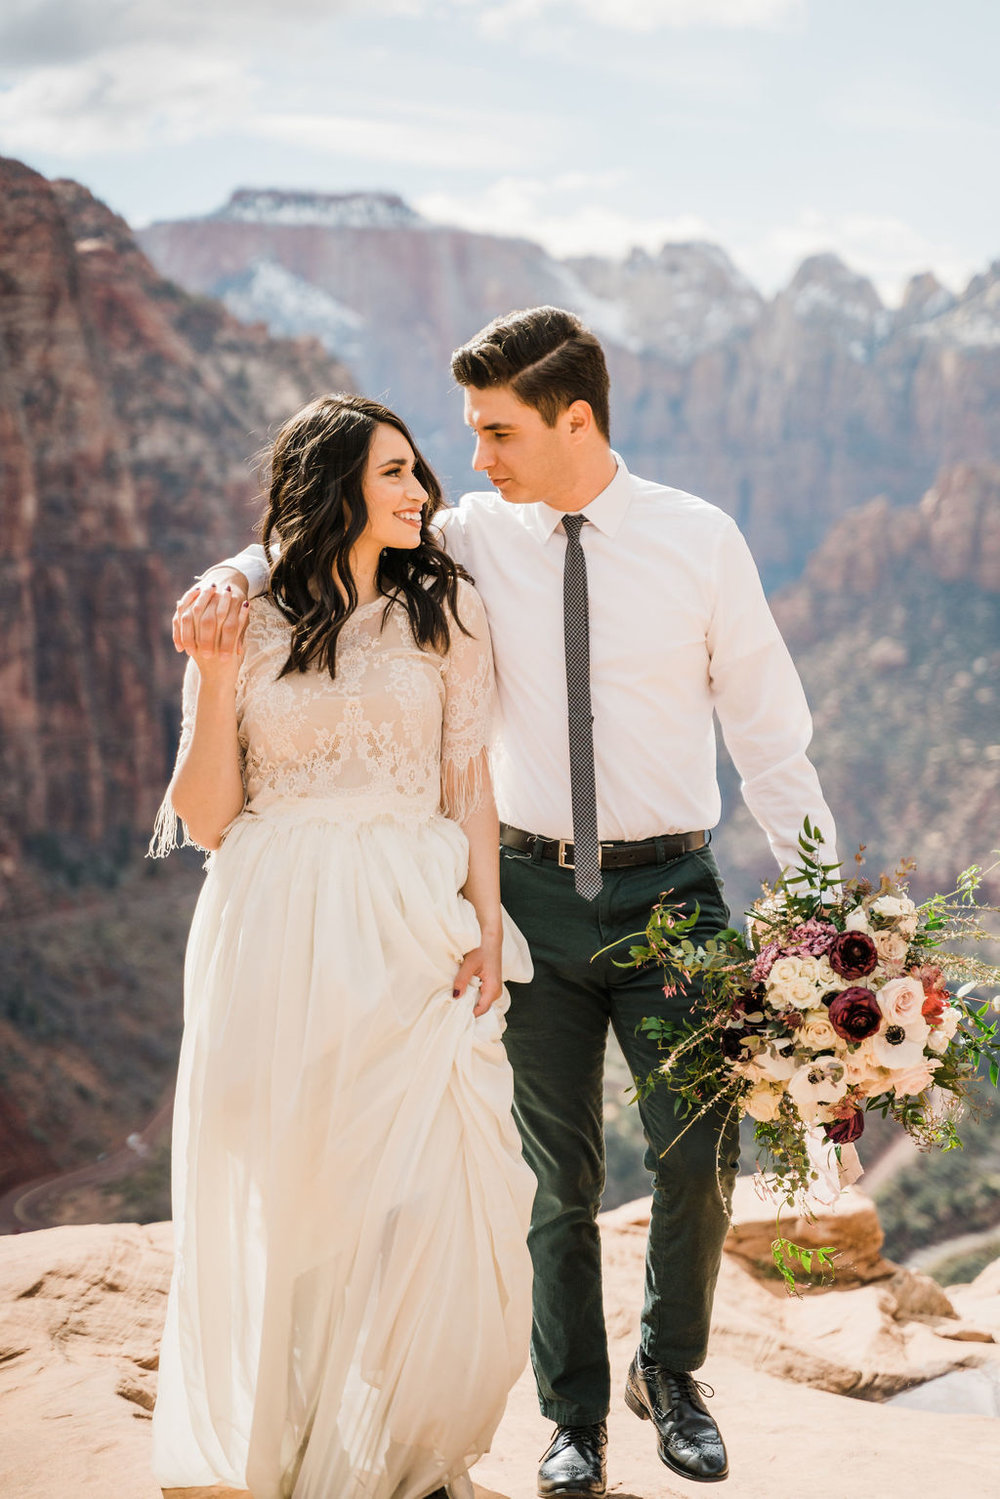 Dasya + Shiloh Zion National Park Bridal Shoot Christine Maduex Photography